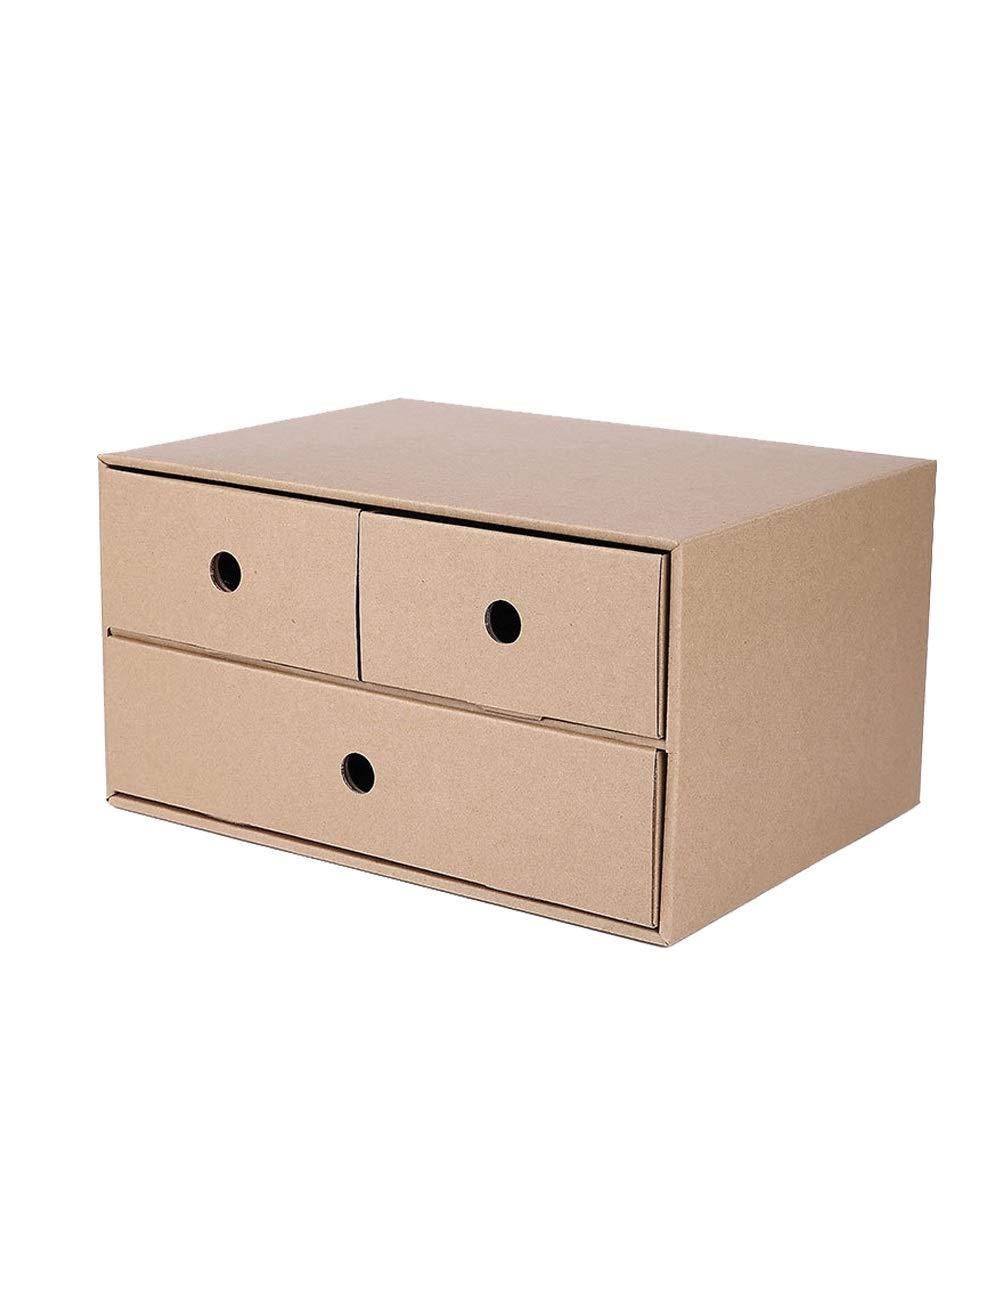 File Cabinets Home Office Furniture Office Organizer File Holder A4 Plastic Data Cabinet Locker Drawer Desktop Cabinet File Storage Cabinet Storage Box